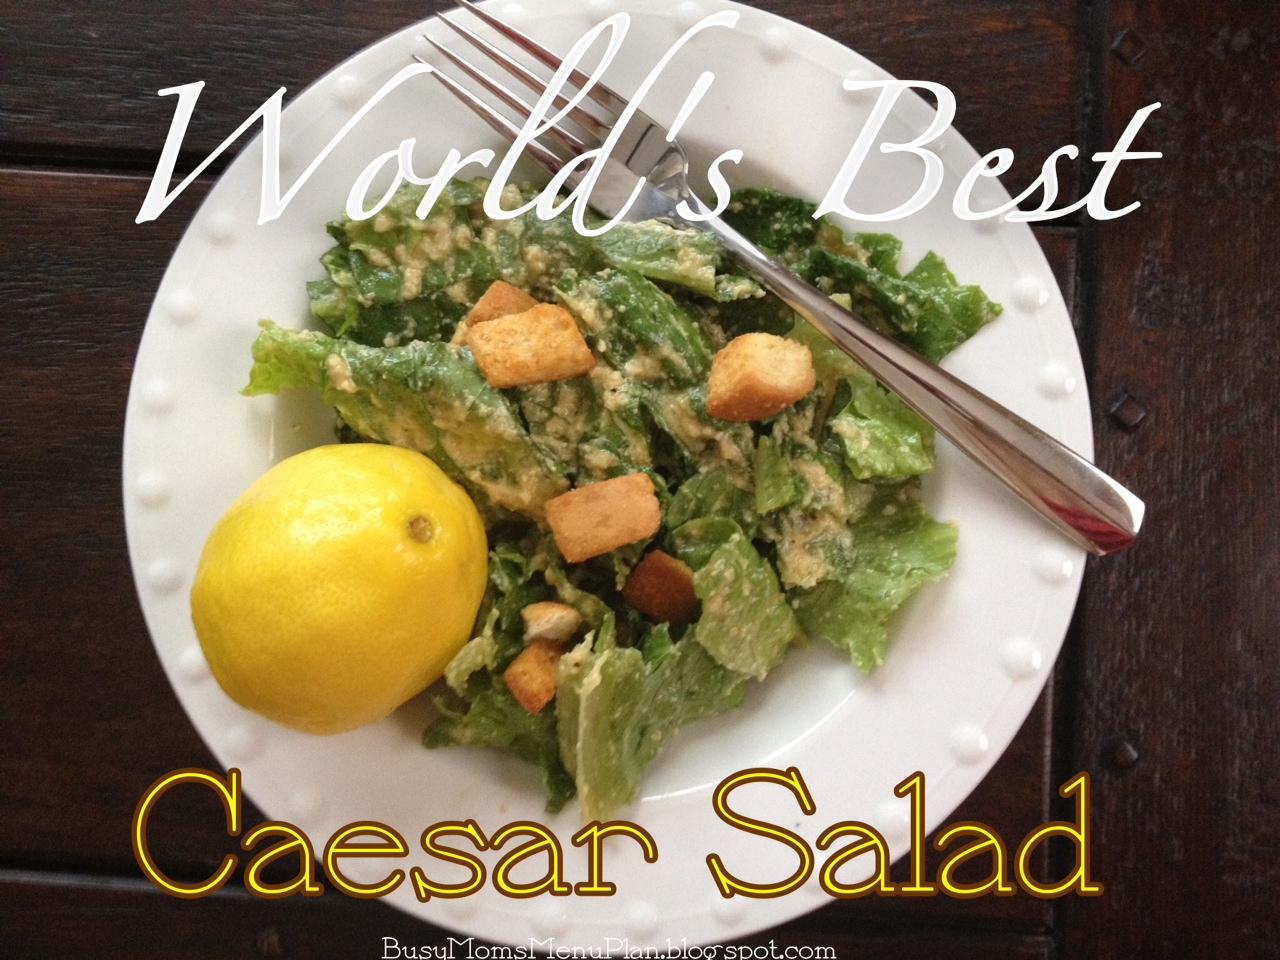 busy mom's menu plan world's best caesar salad recipe